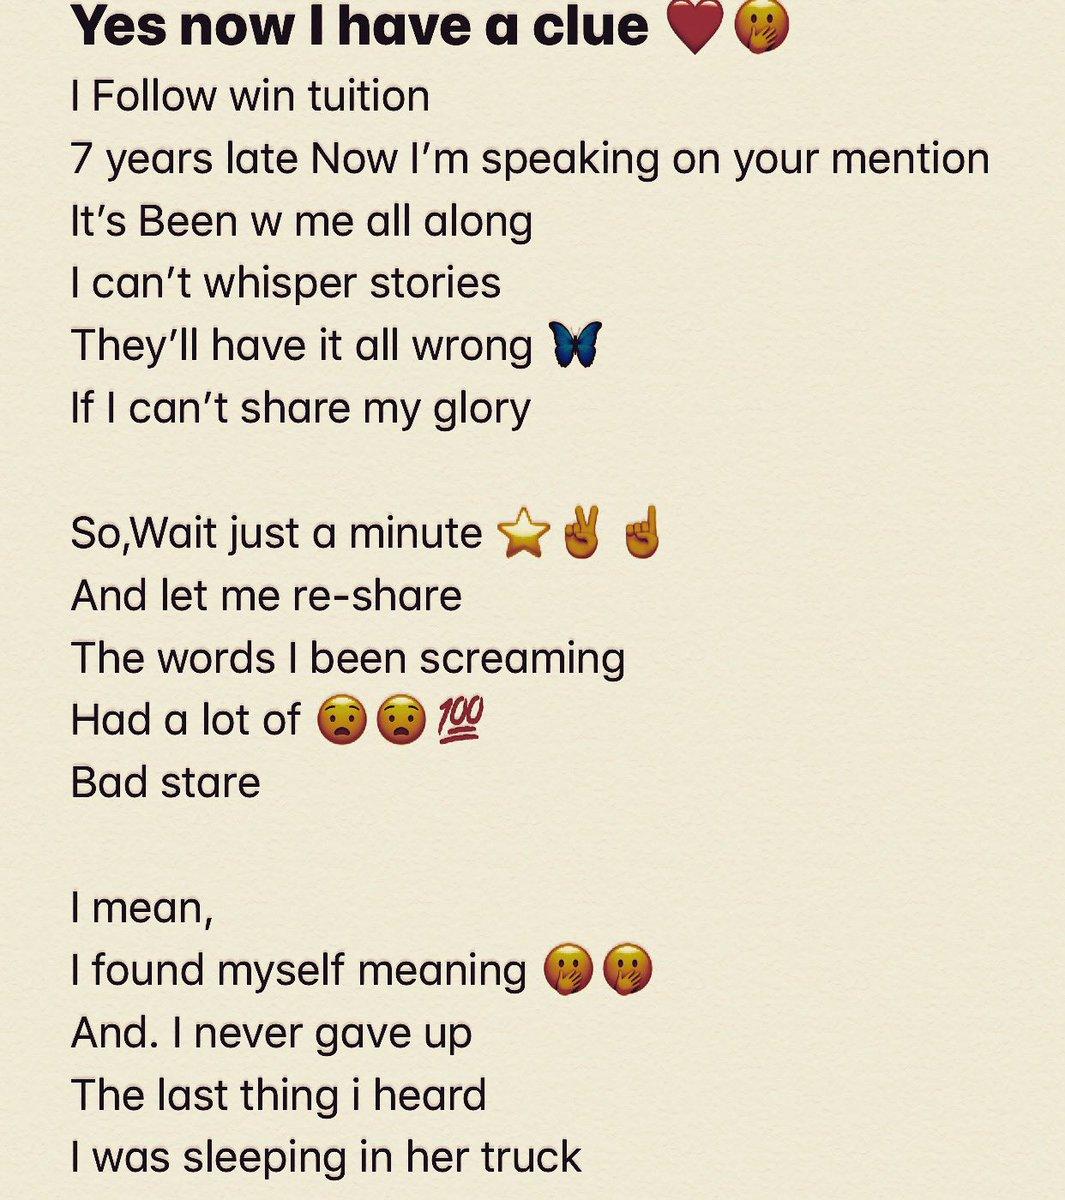 #evolution #change #evolve #vegan #kindness #love #fear #tragedy #producer #dj #spotify #magdyhaddad #poet114 #poetry #haddad #jordan #awakening #kundalini #yoga #spirit #soul #istanbul #dubai #dance #water  #moon #oxygen moon #sun https://t.co/Qg76xlypZV